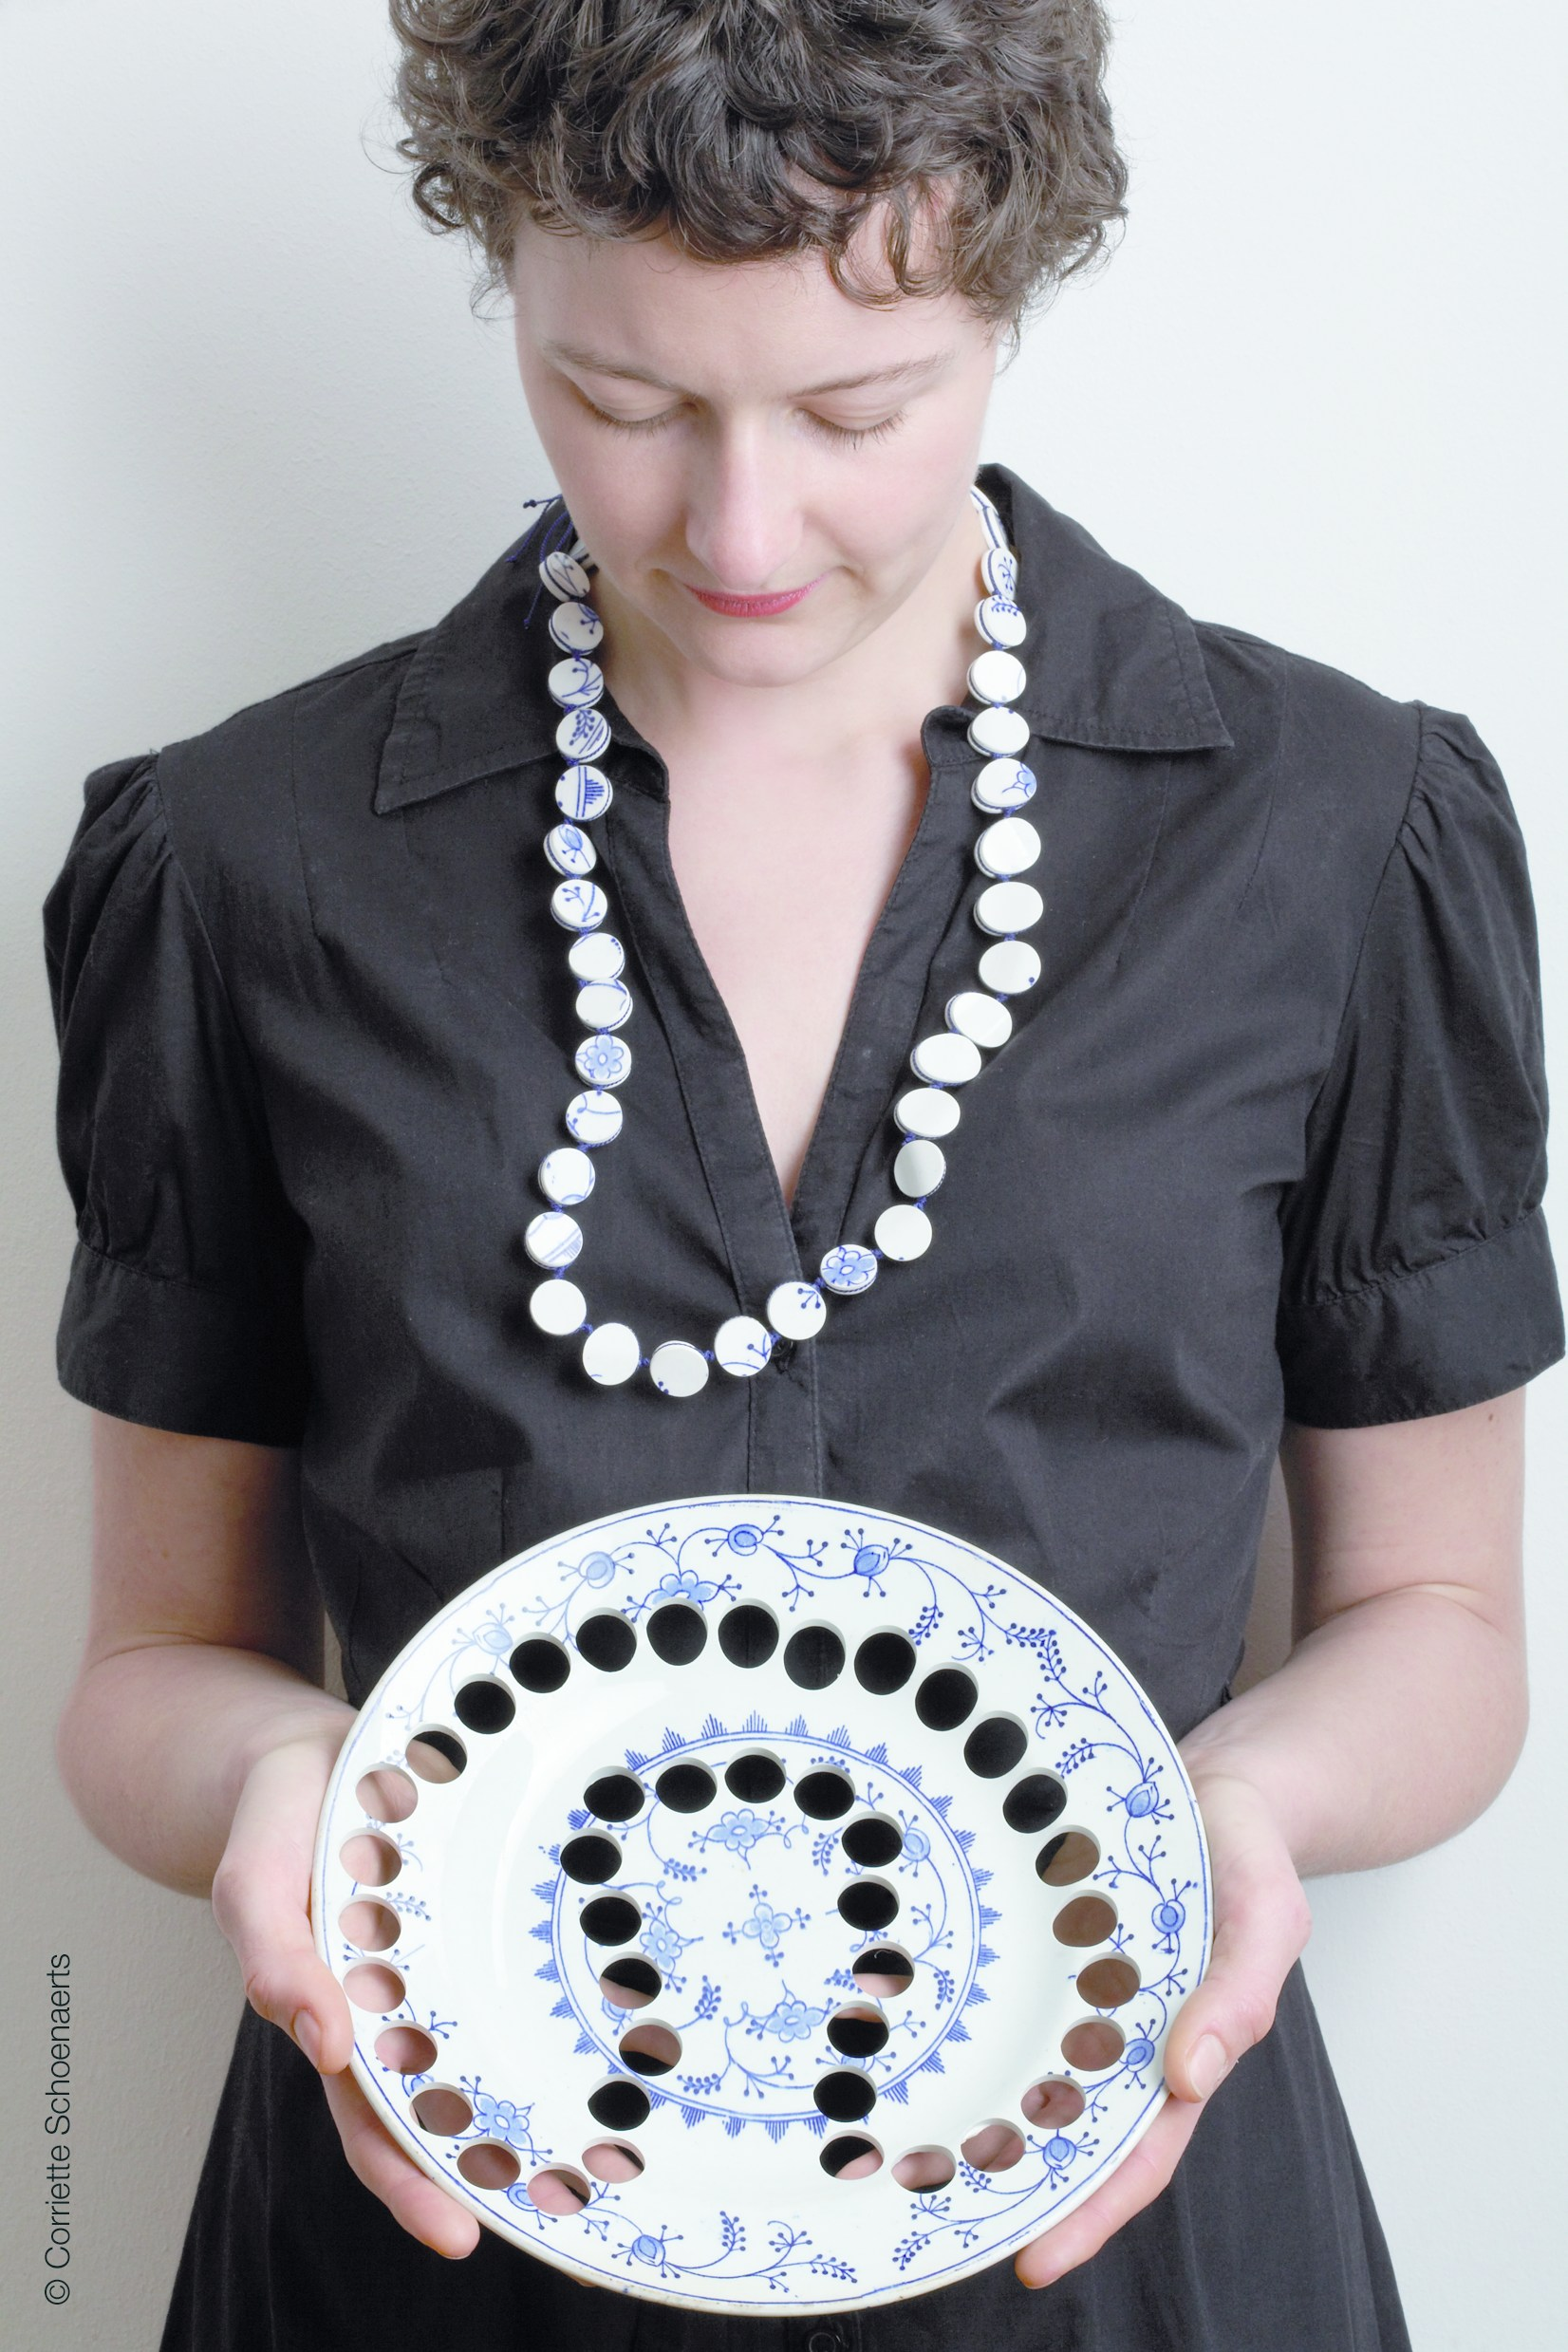 Gésine Hackenberg, halssieraad. Foto Coriette Schoenaerts, keramiek, textiel